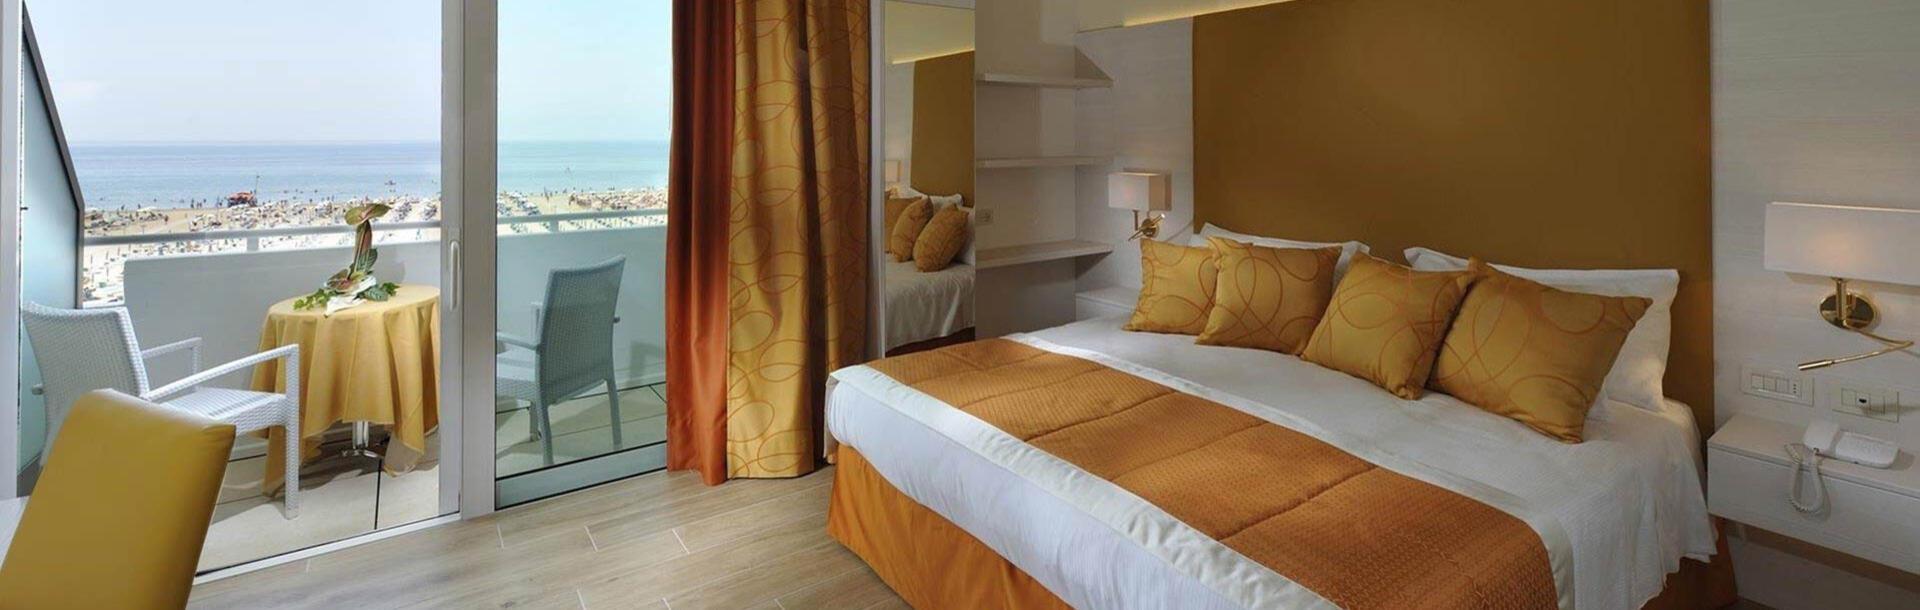 hotel-montecarlo en diamond-rooms 013